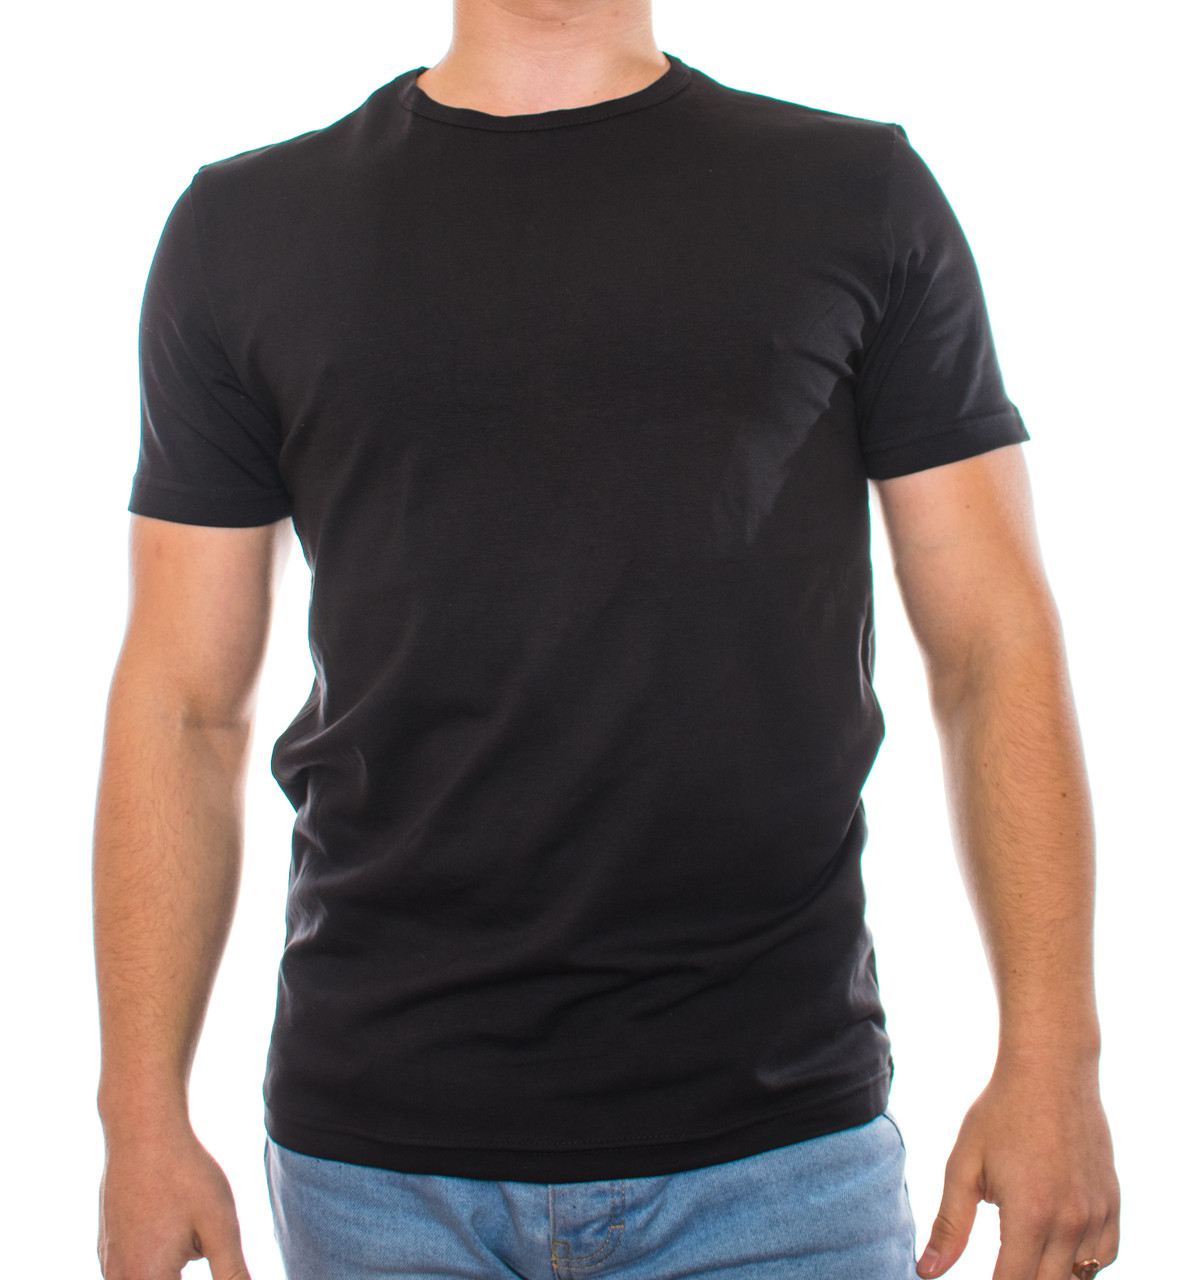 Bono Футболка мужская черная 950101